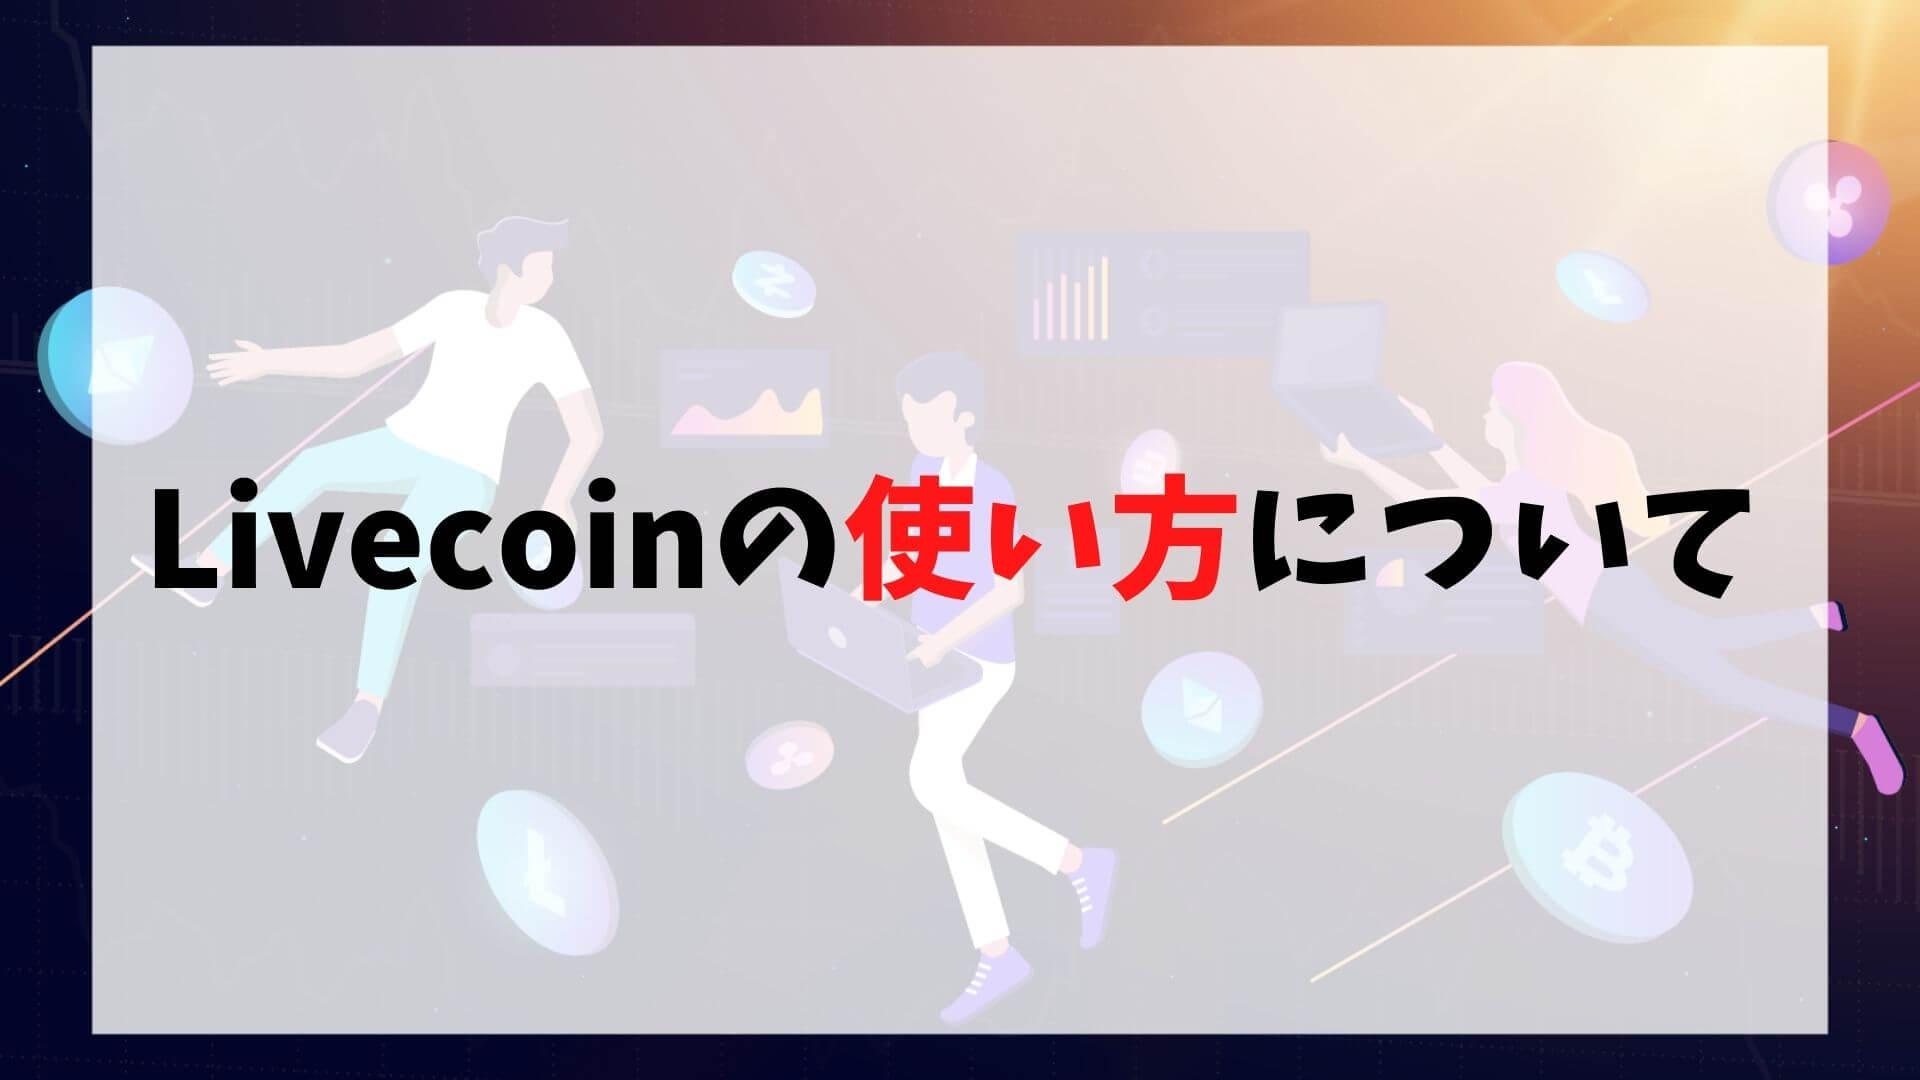 Livecoinの使い方